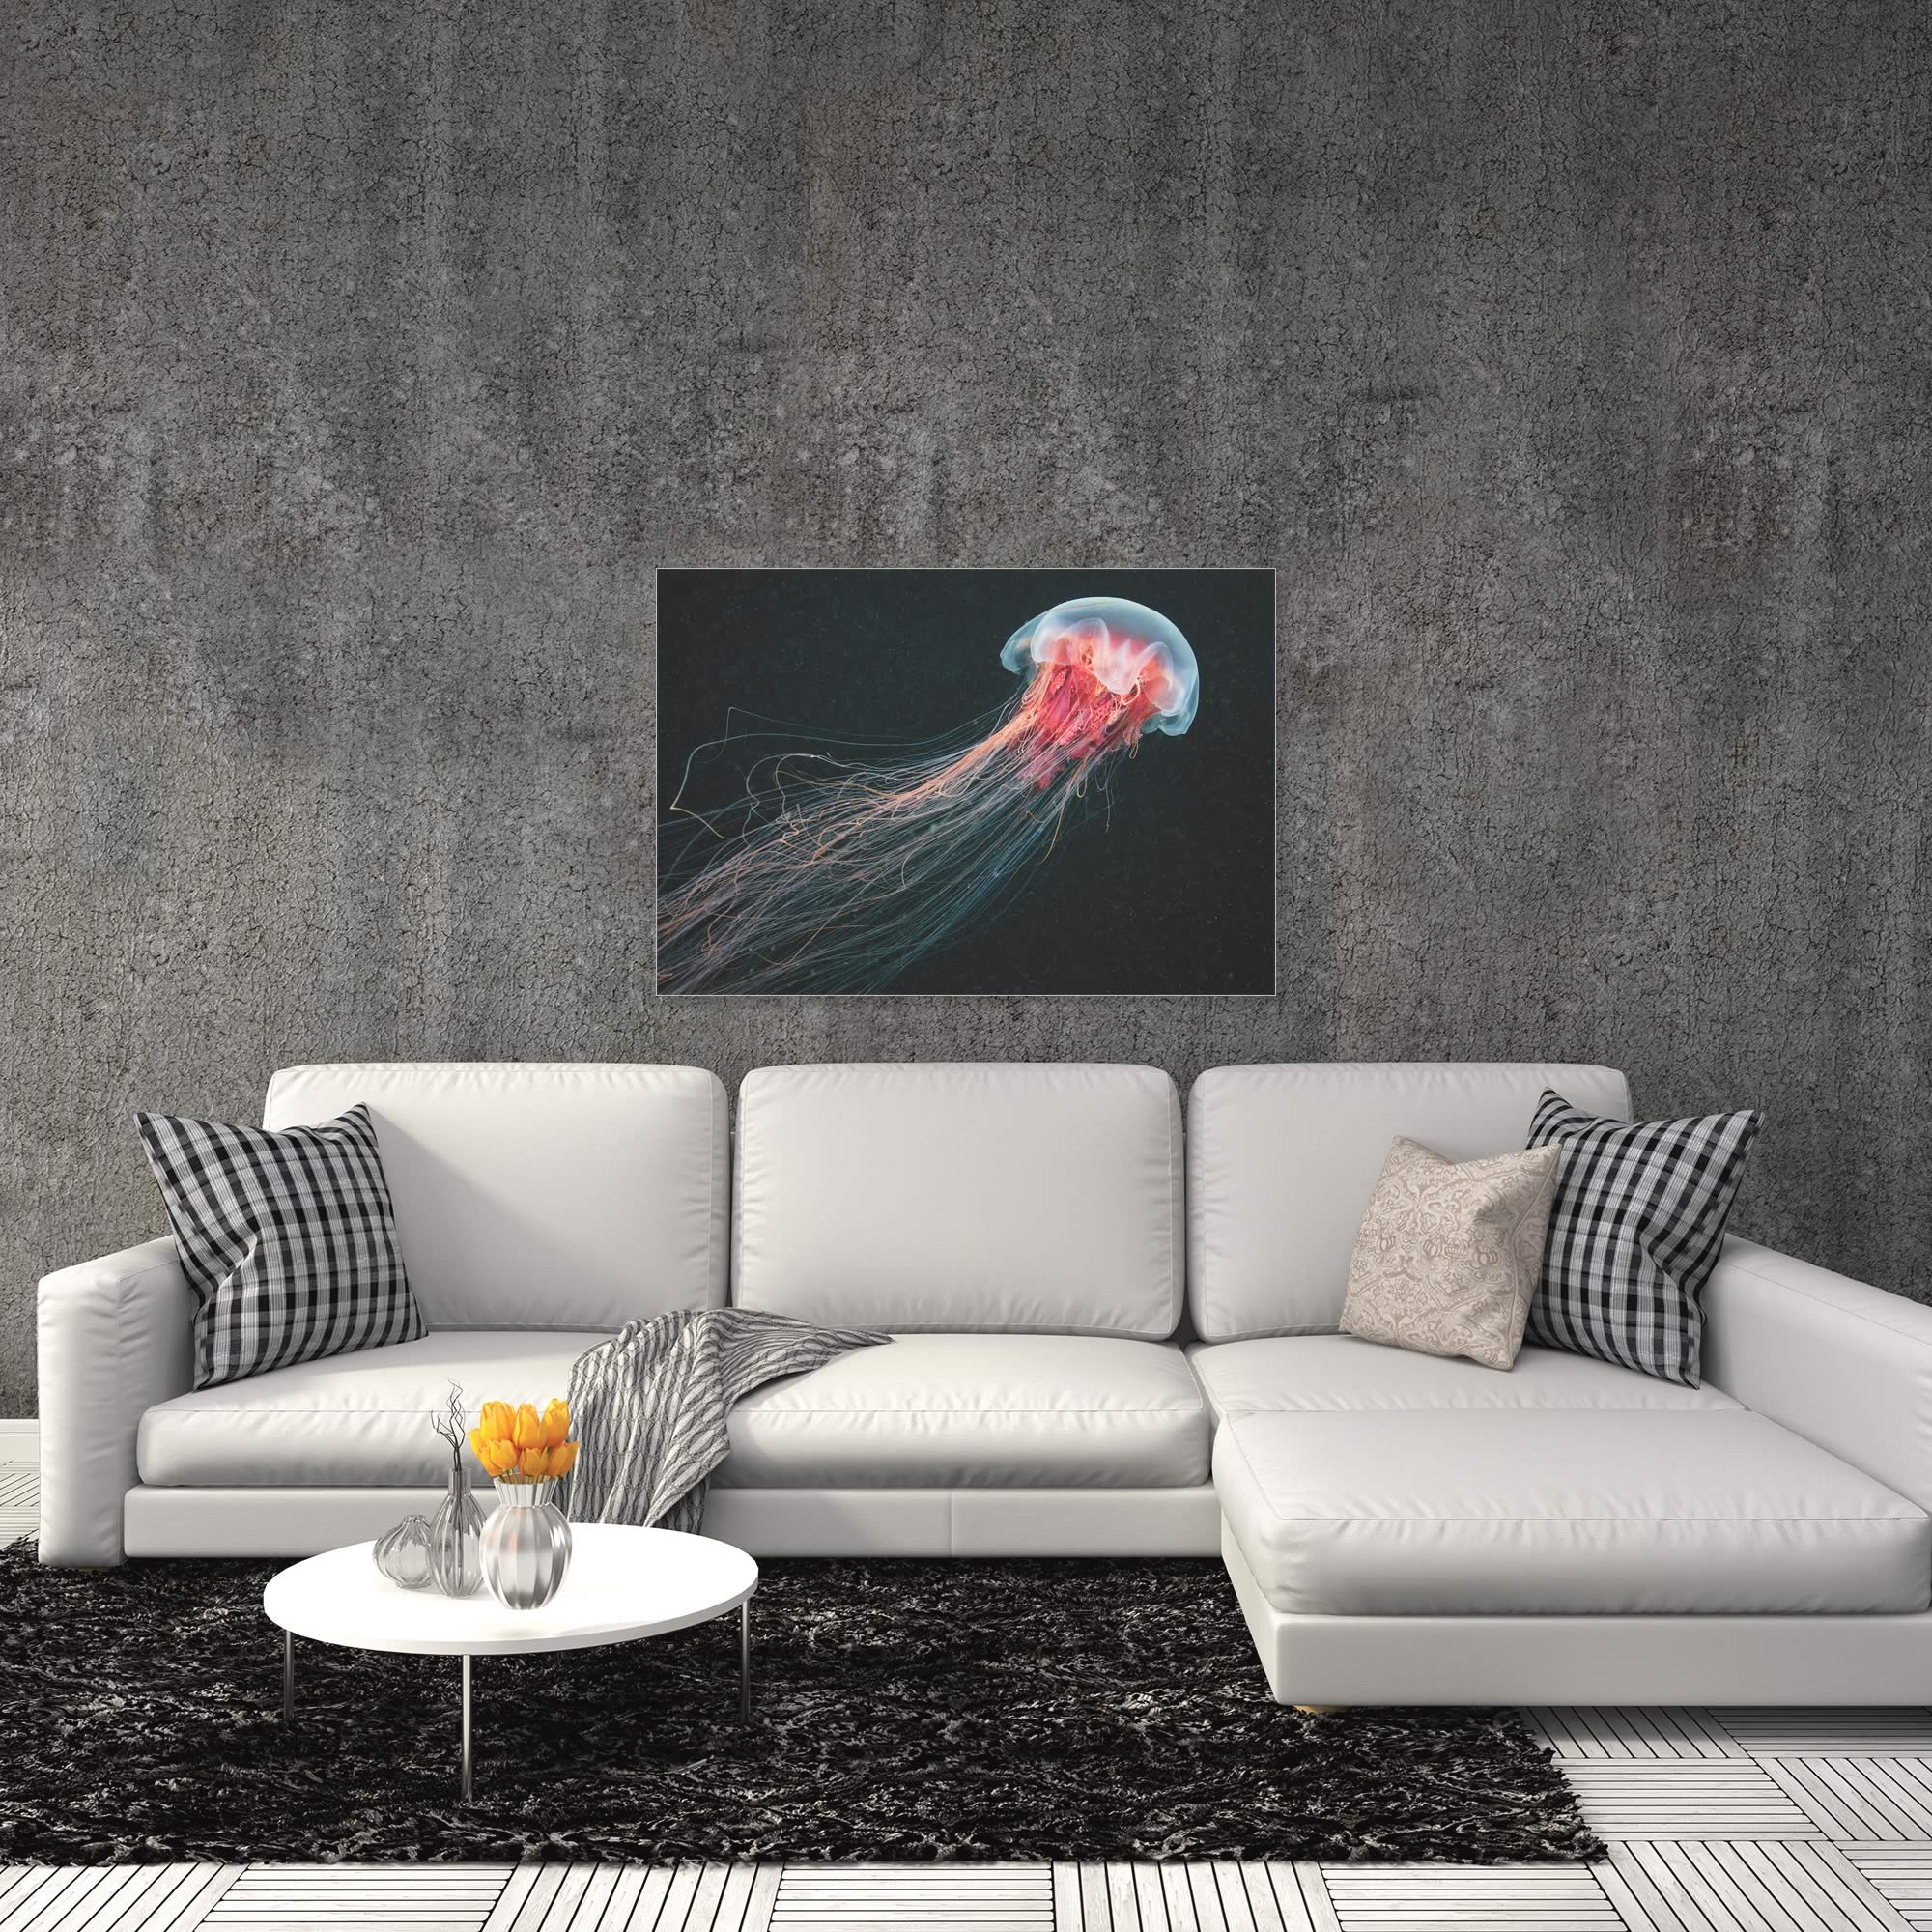 Longtail Jellyfish by Alexander Semenov - Jellyfish Artwork on Metal or Acrylic - Alternate View 1